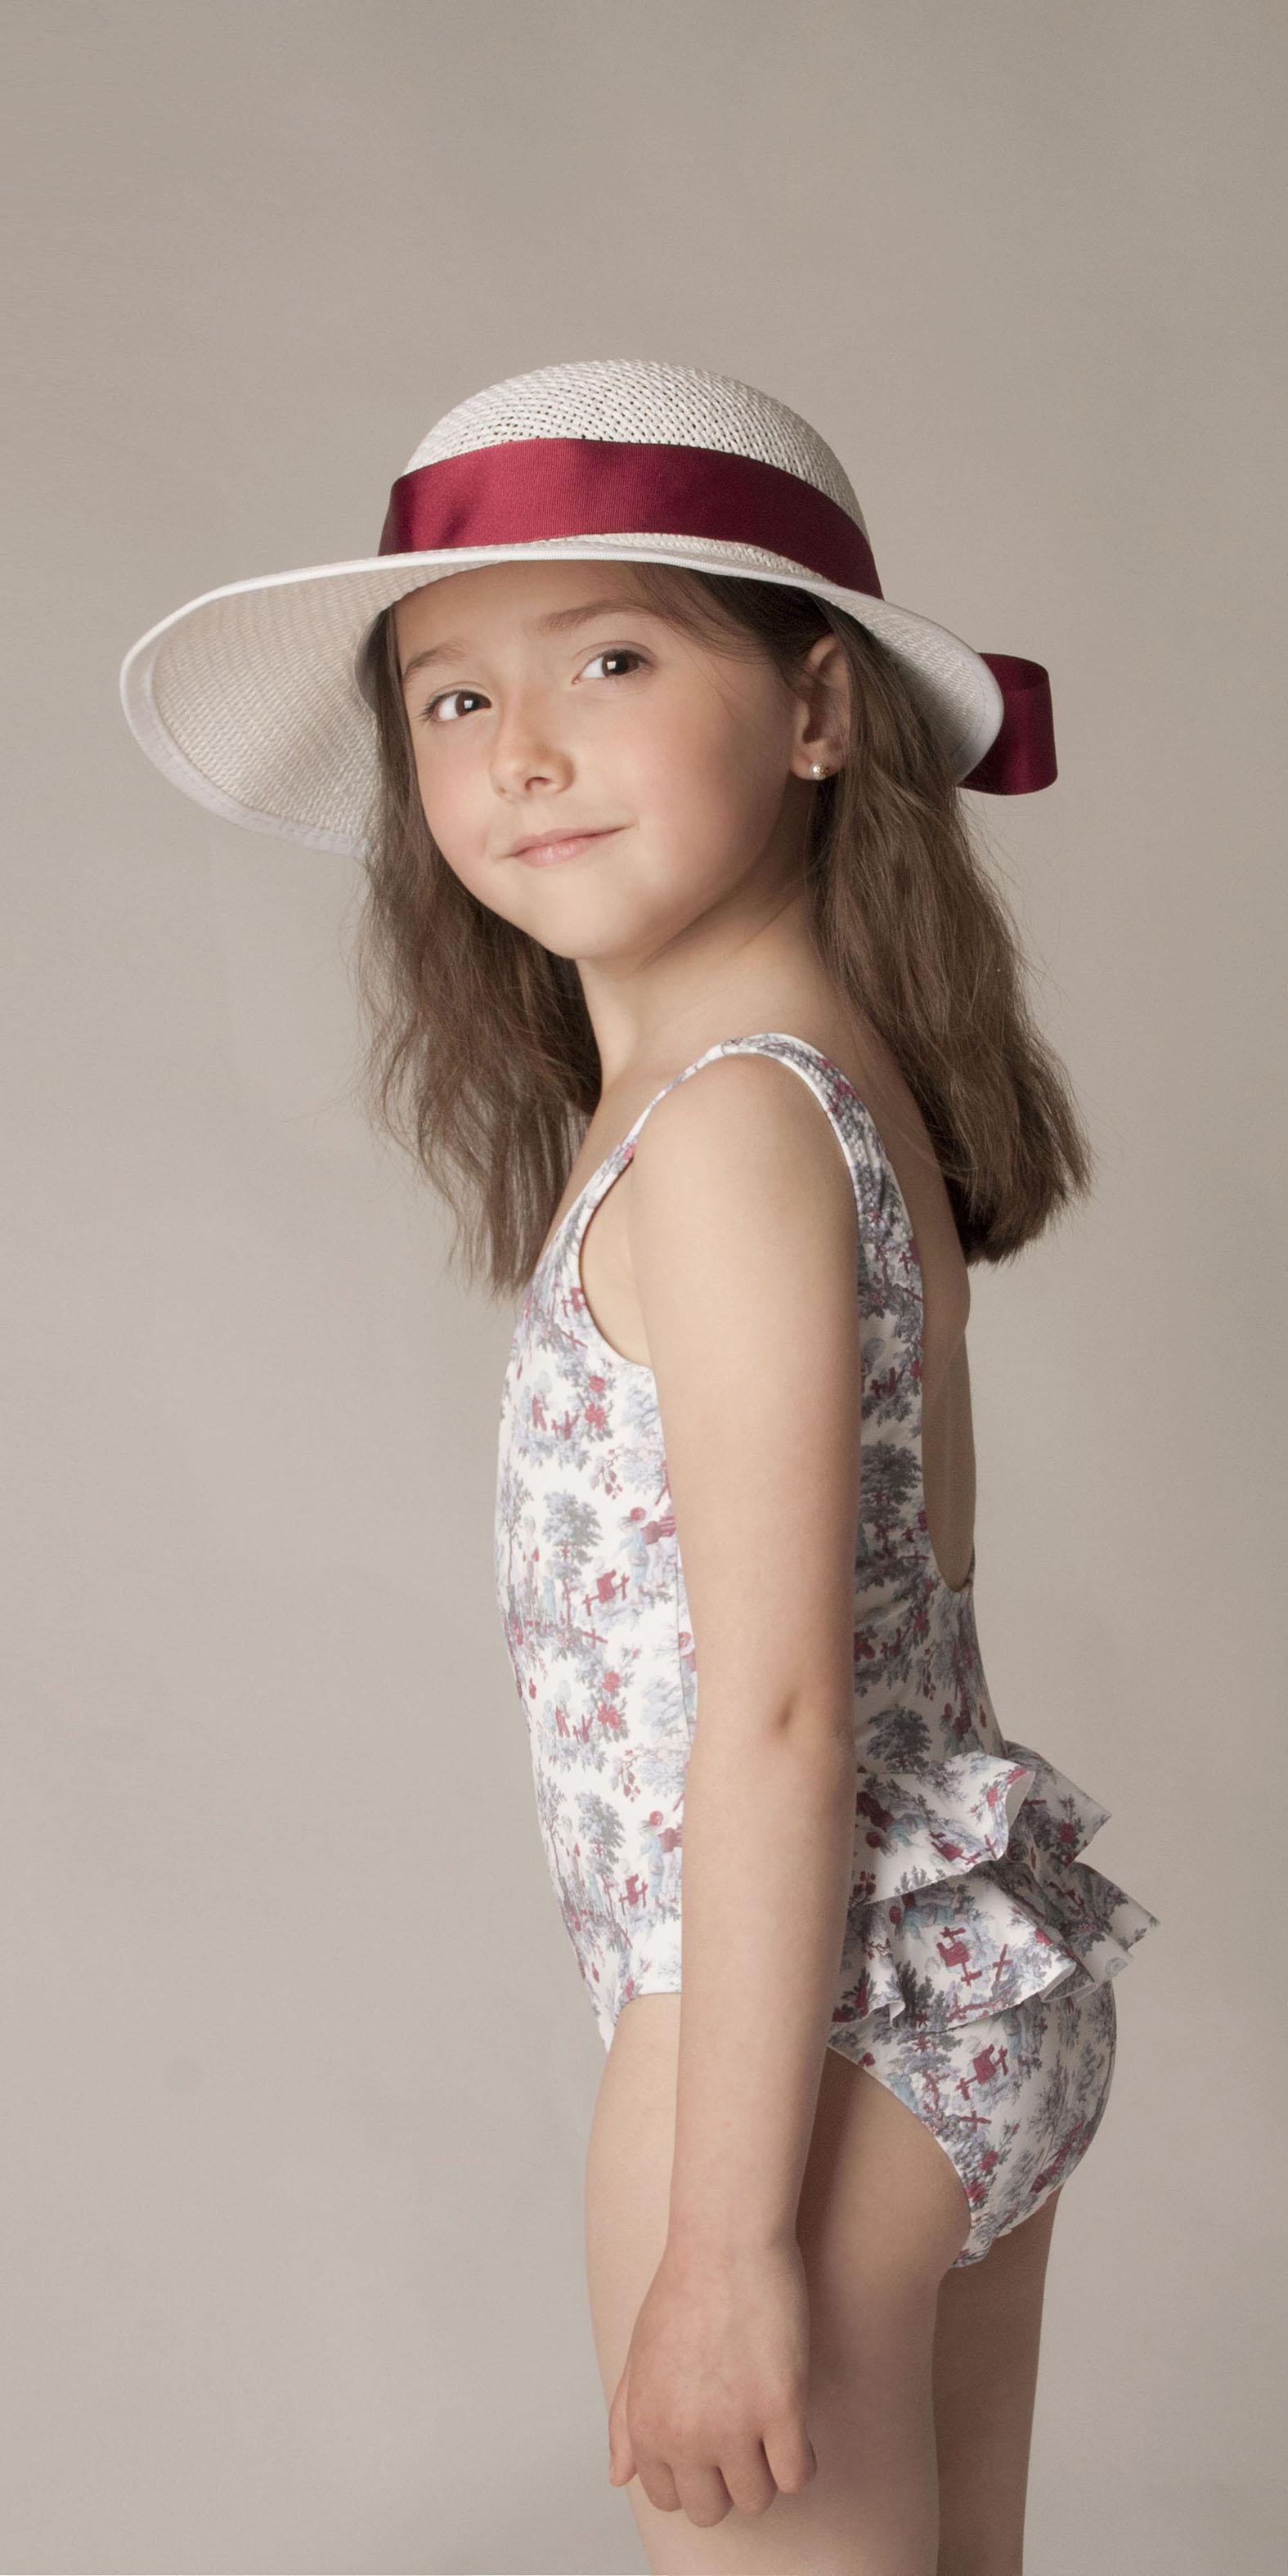 Los trajes de ba o infantil de luela en fimi fimi for Ropa de bano infantil